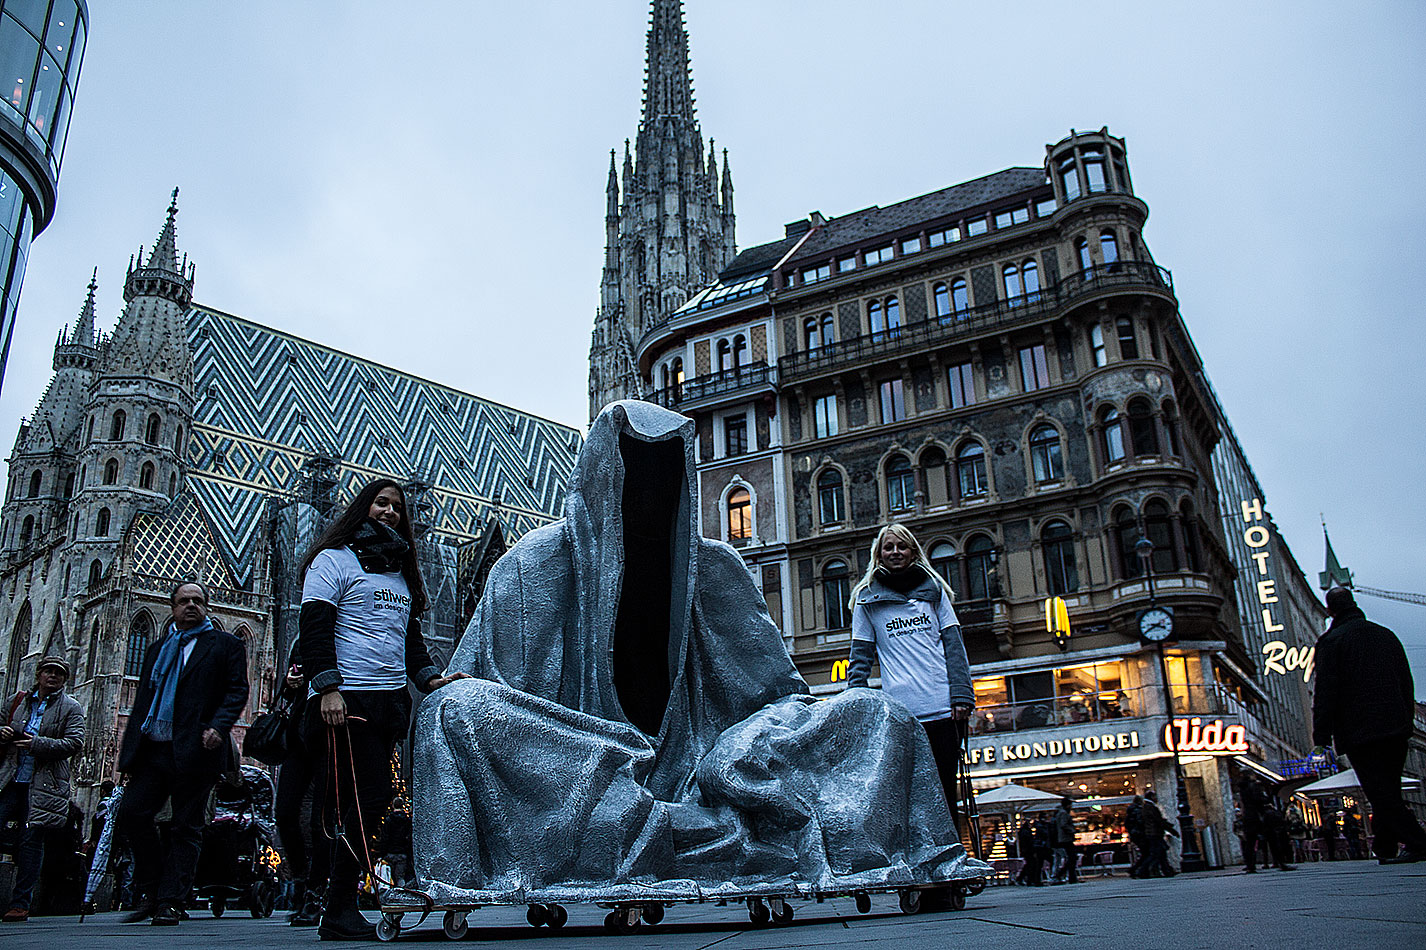 stilwerk-wien-design-tower-art-antique-fair-vienna-wikam-guardians-of-time-manfred-kielnhofer-duekouba-designkooperative-public-art-sculpture-transport-design-tour-vienna-4980